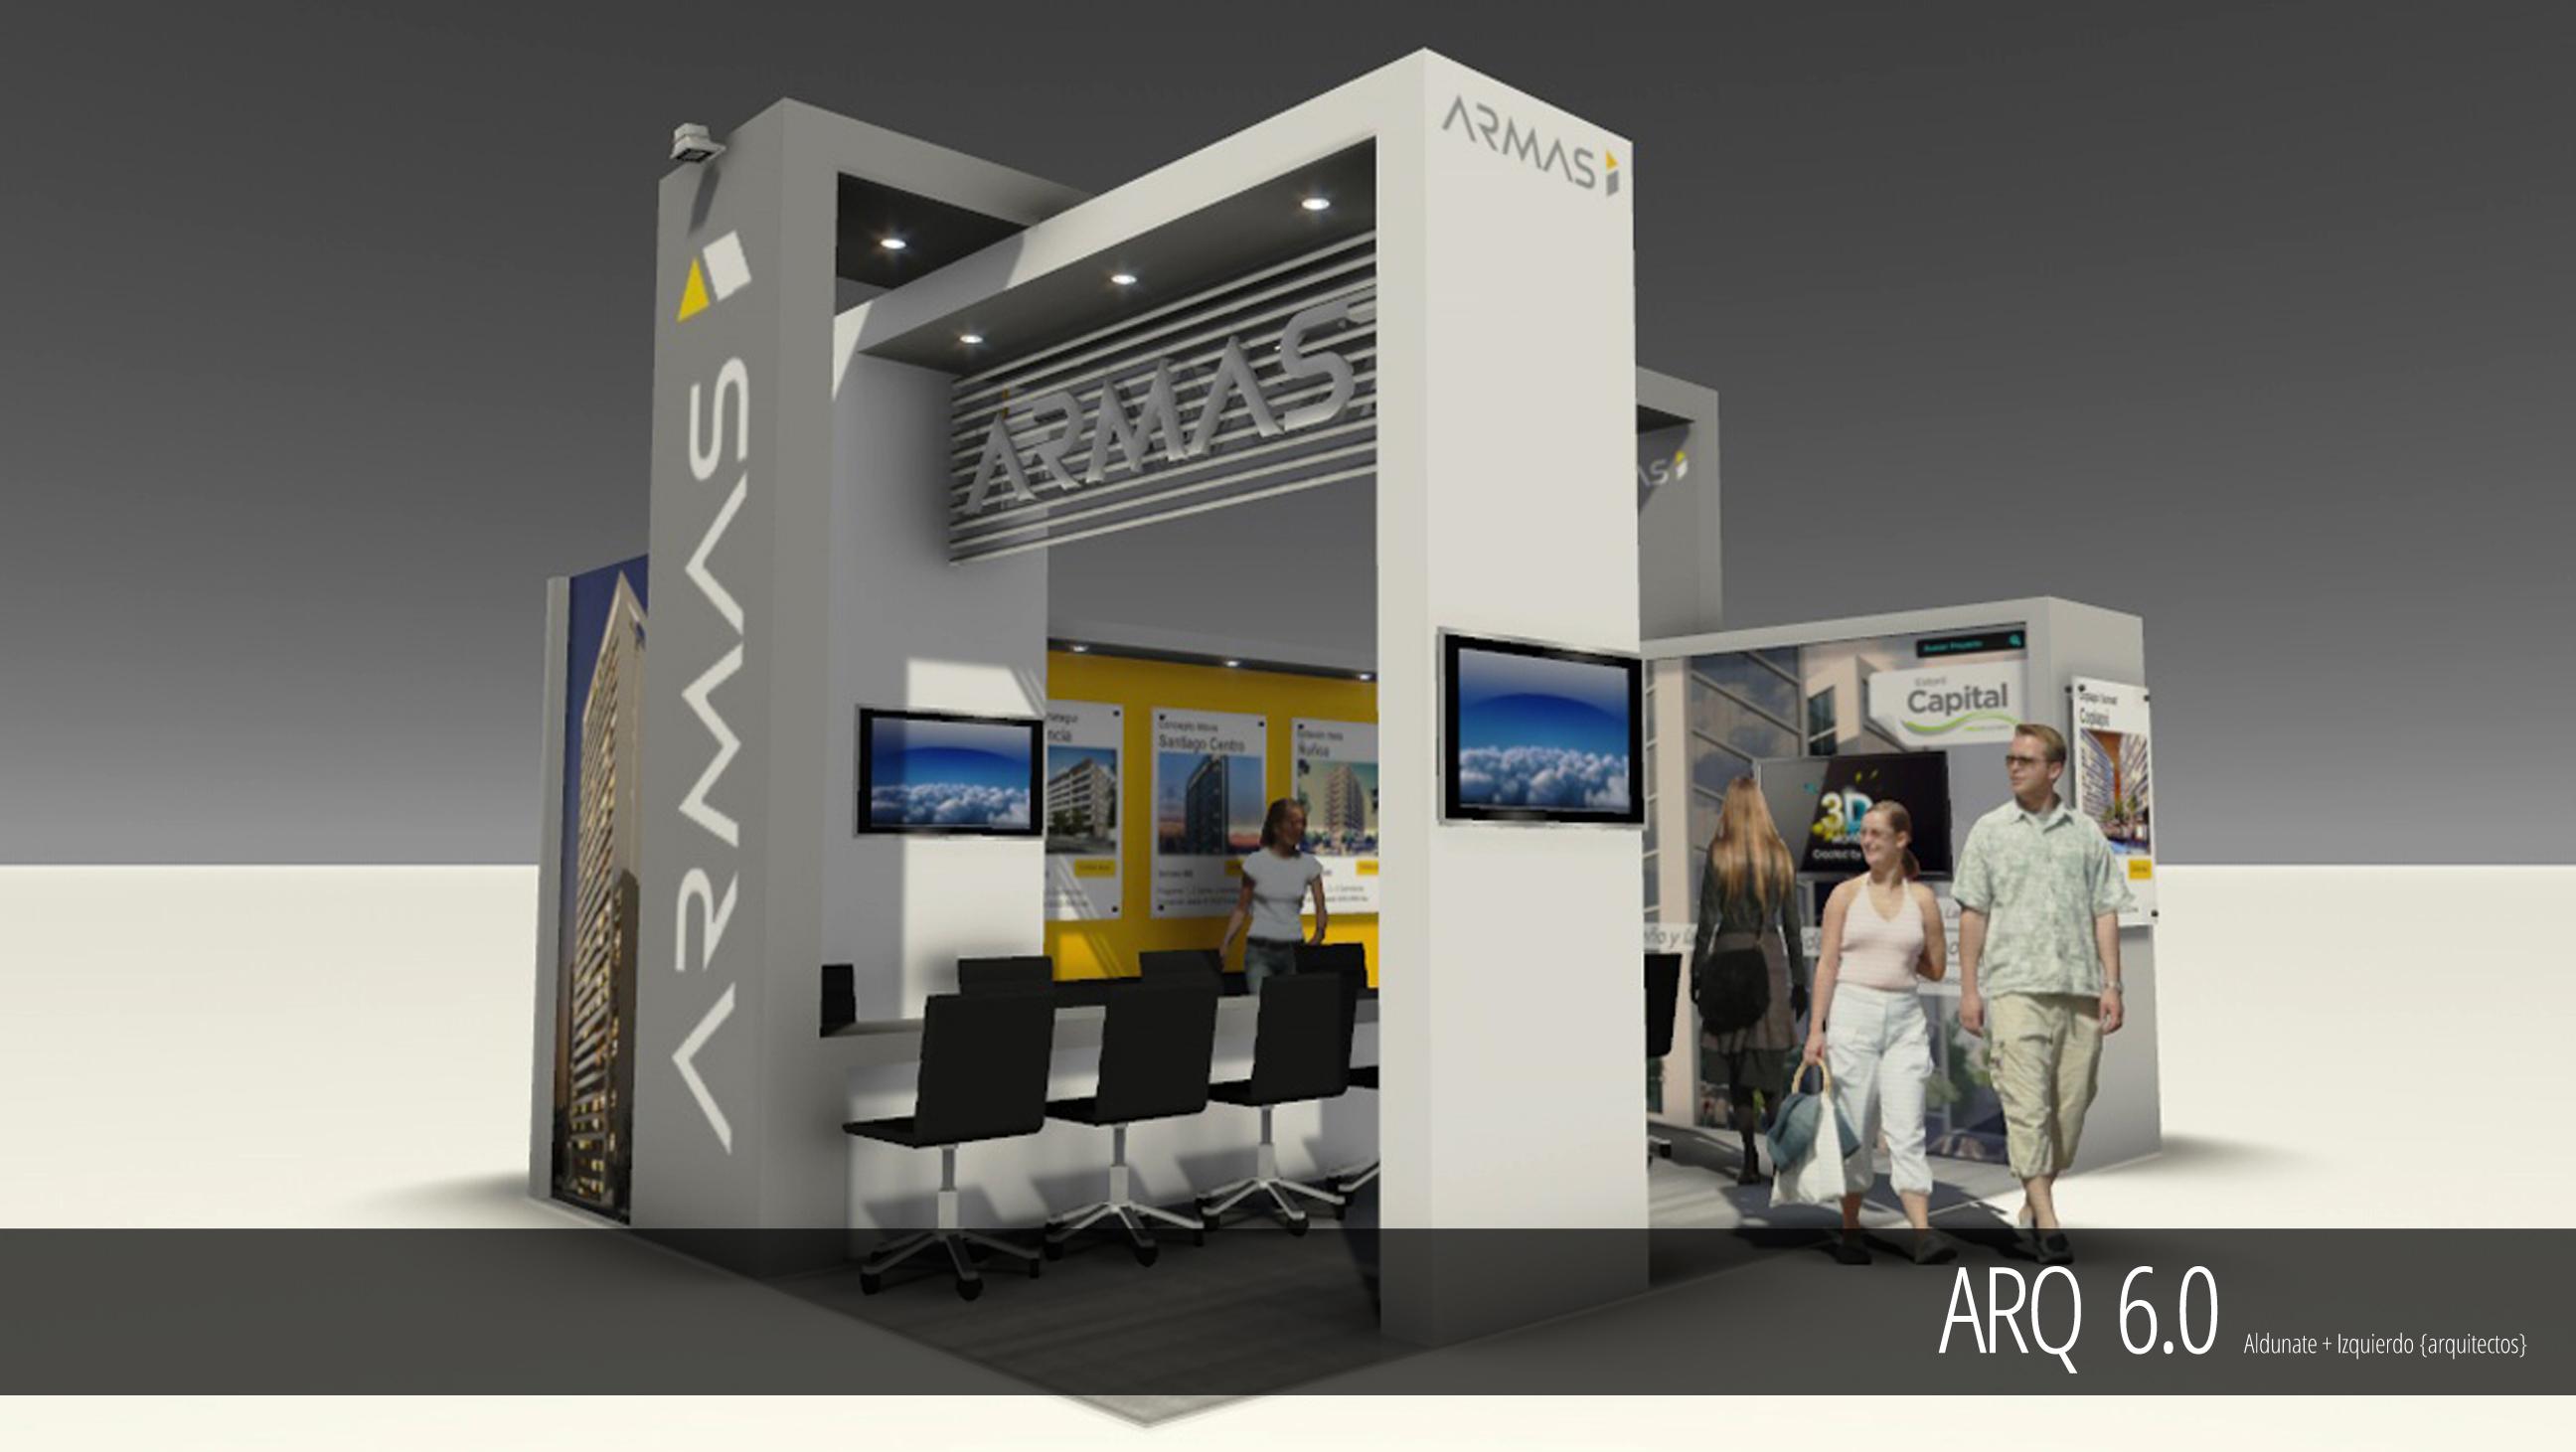 ARQ 6 - Armas Expovivienda - 02.jpg